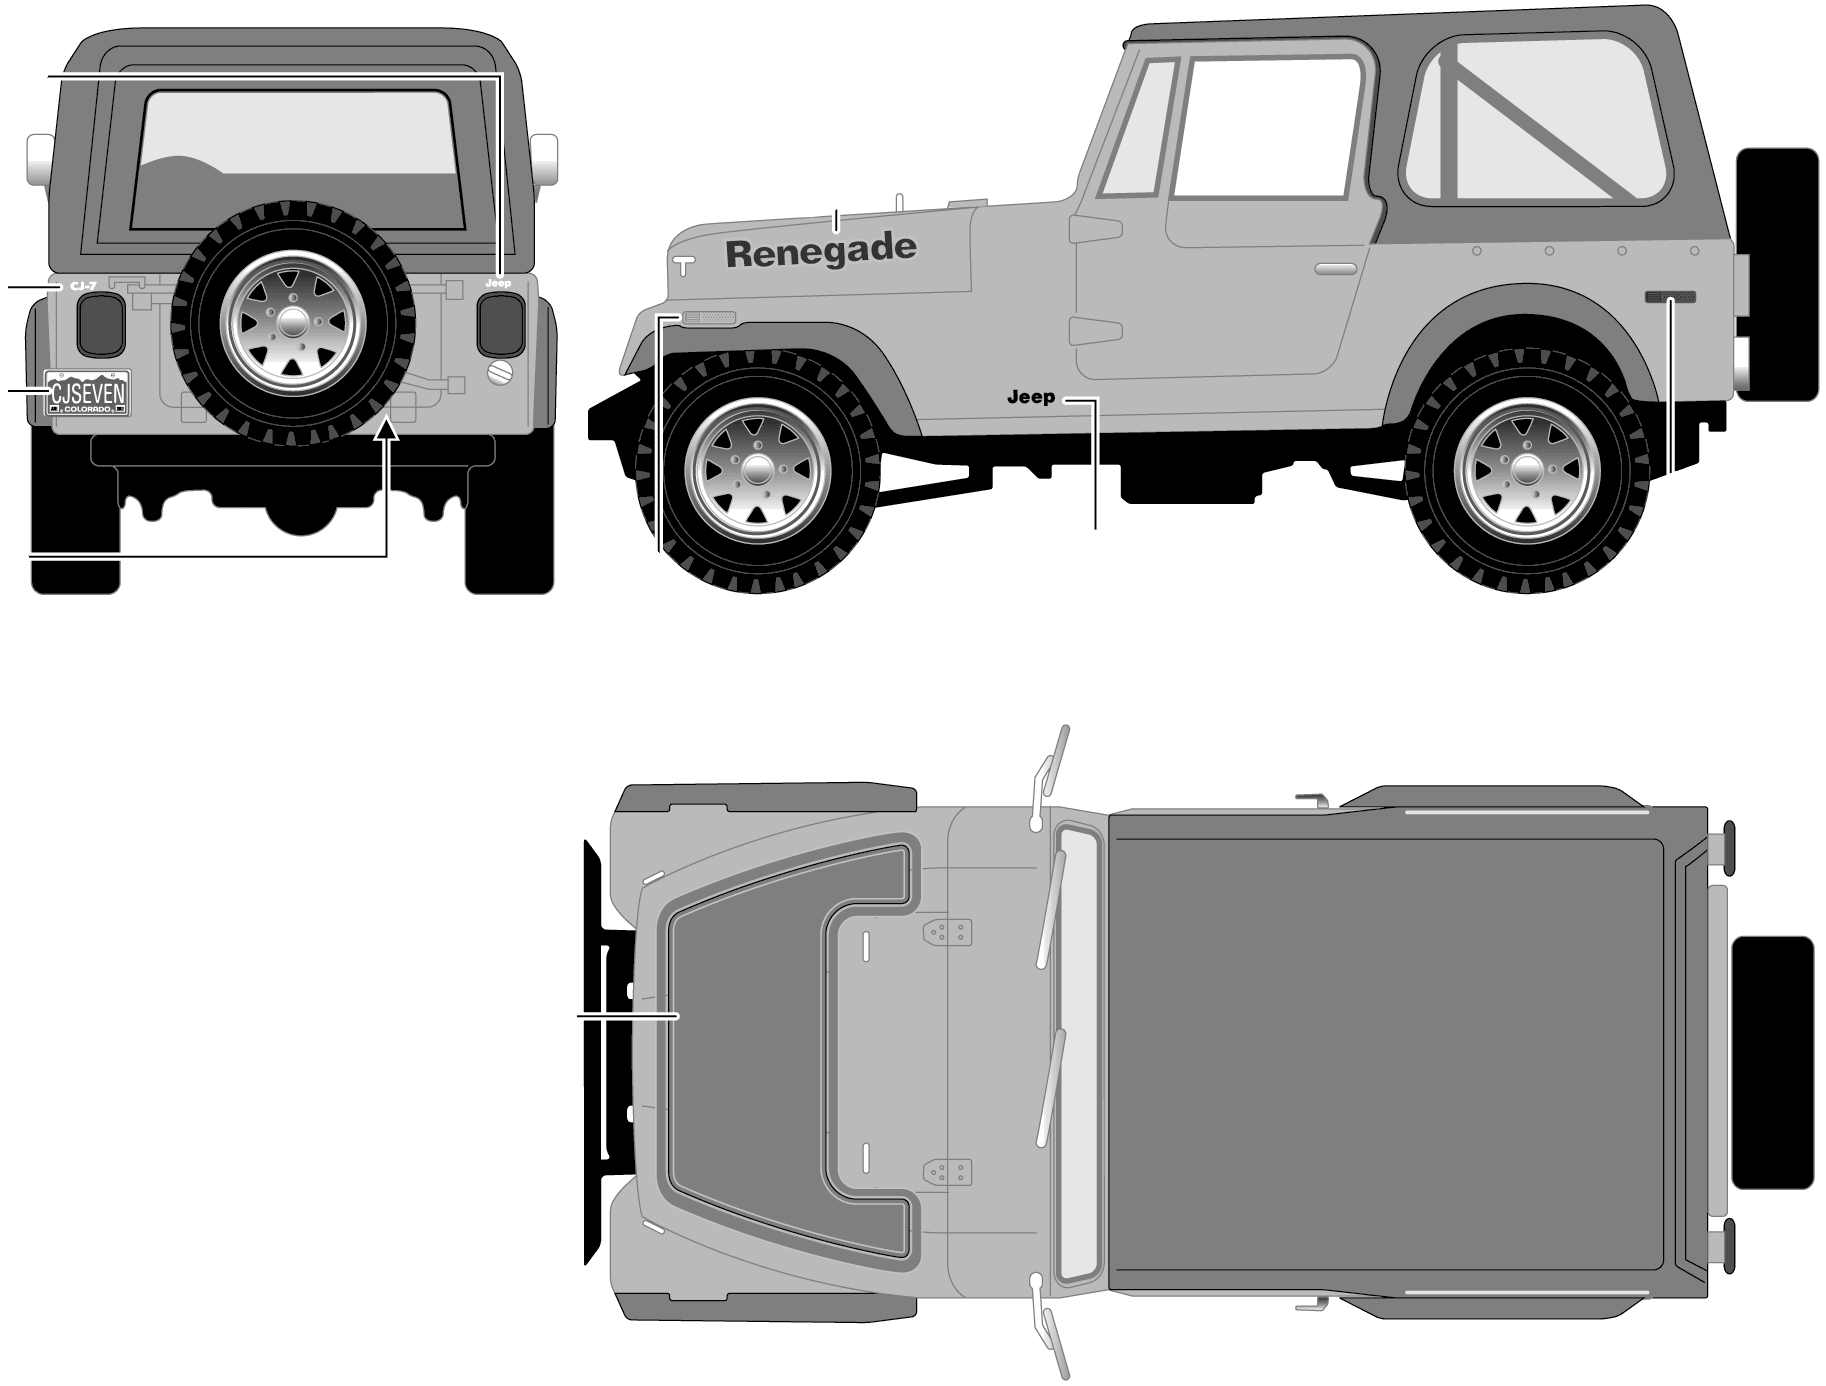 Jeep CJ7 Renegade blueprints